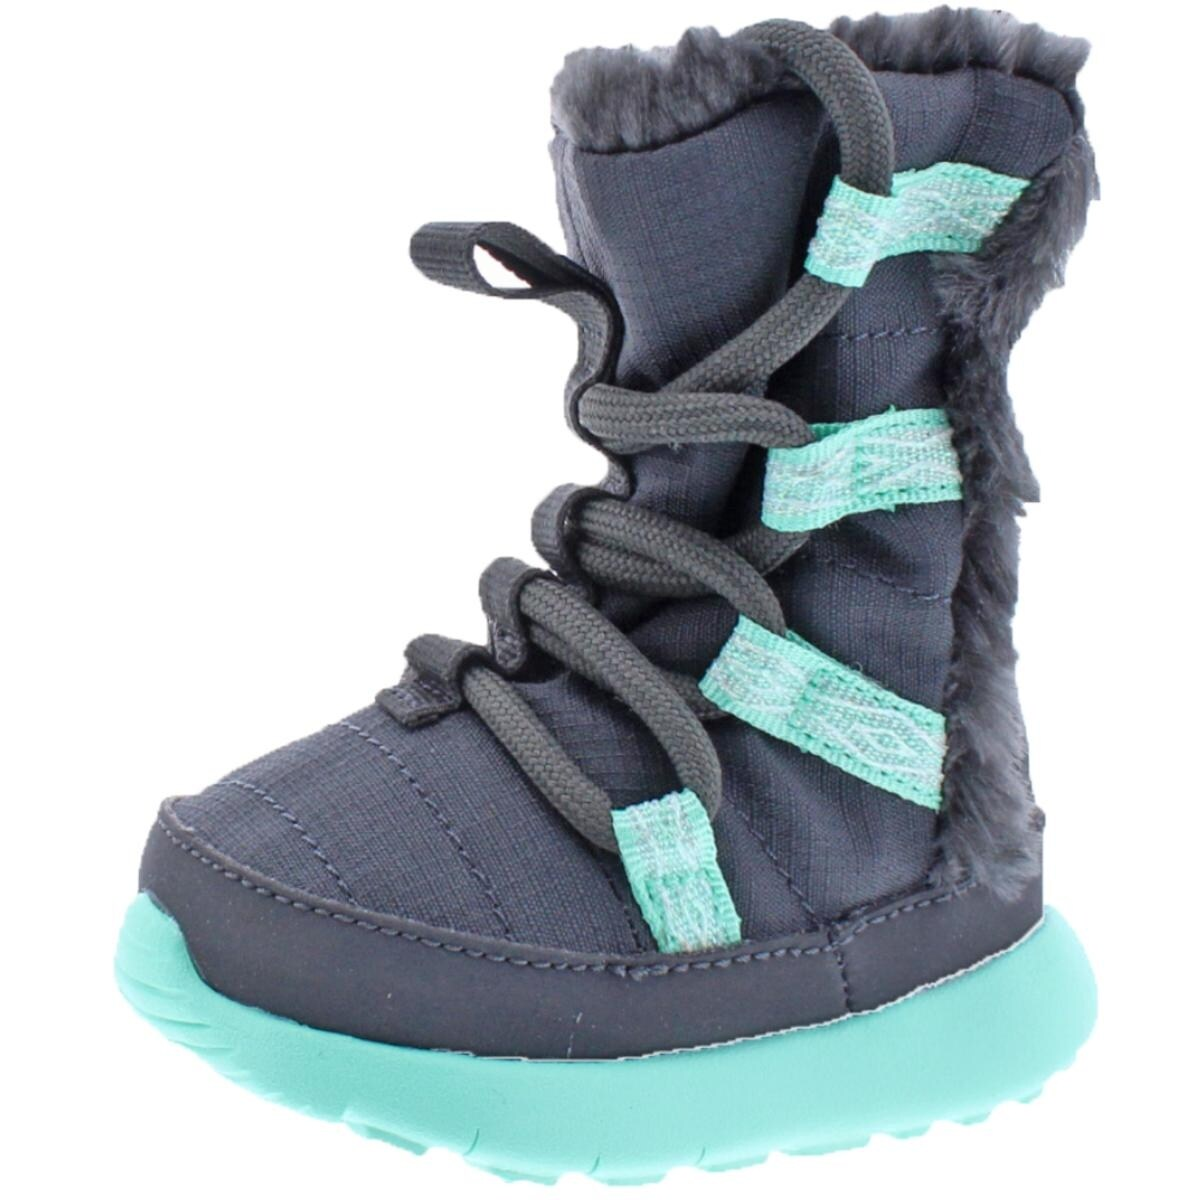 the best attitude b614e 1ce15 Nike Roshe One HI SE Boots Infant Lightweight - 2 medium (b,m) infant